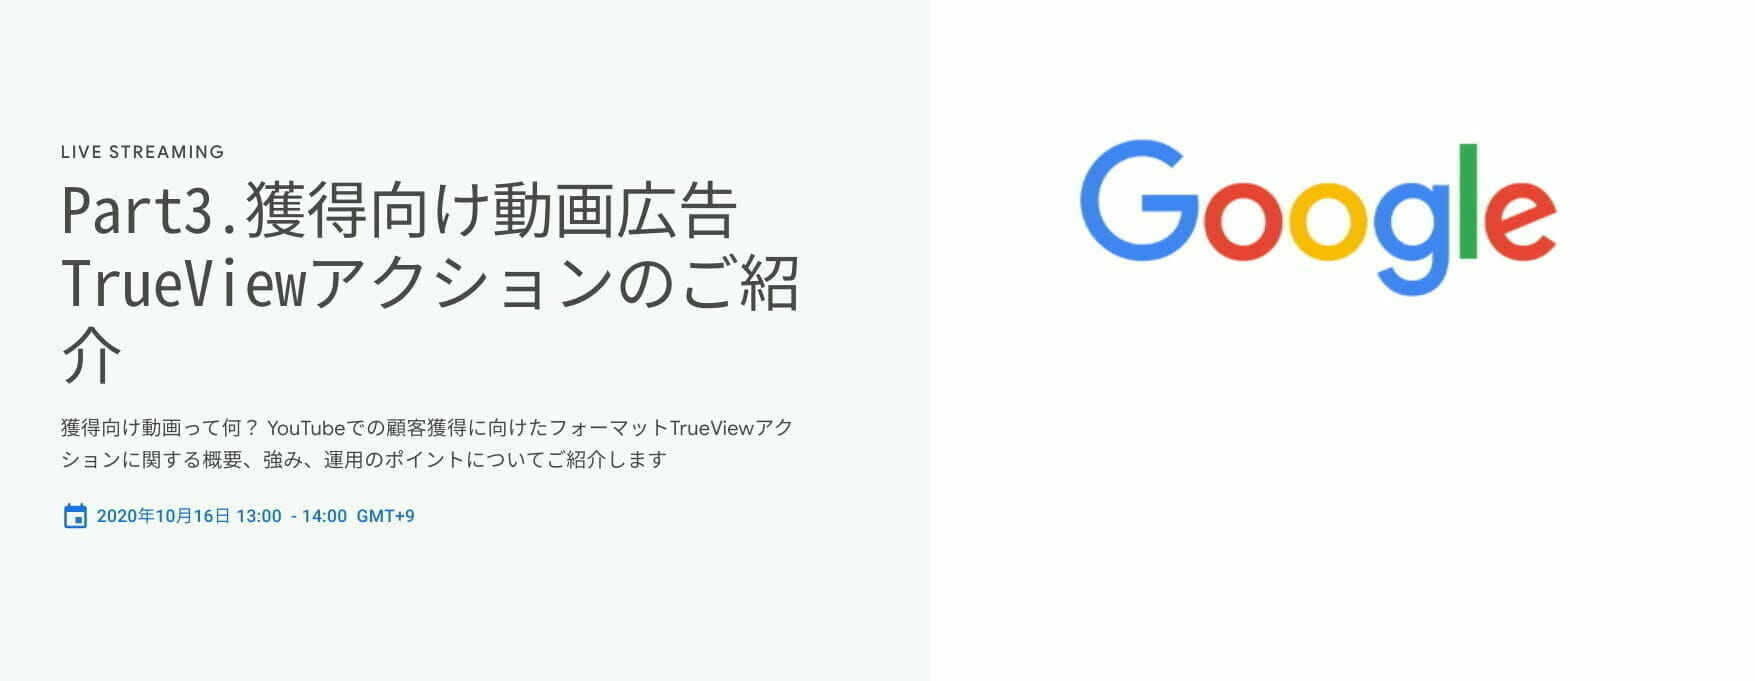 [Google 広告] Part3.獲得向け動画広告TrueViewアクションのご紹介